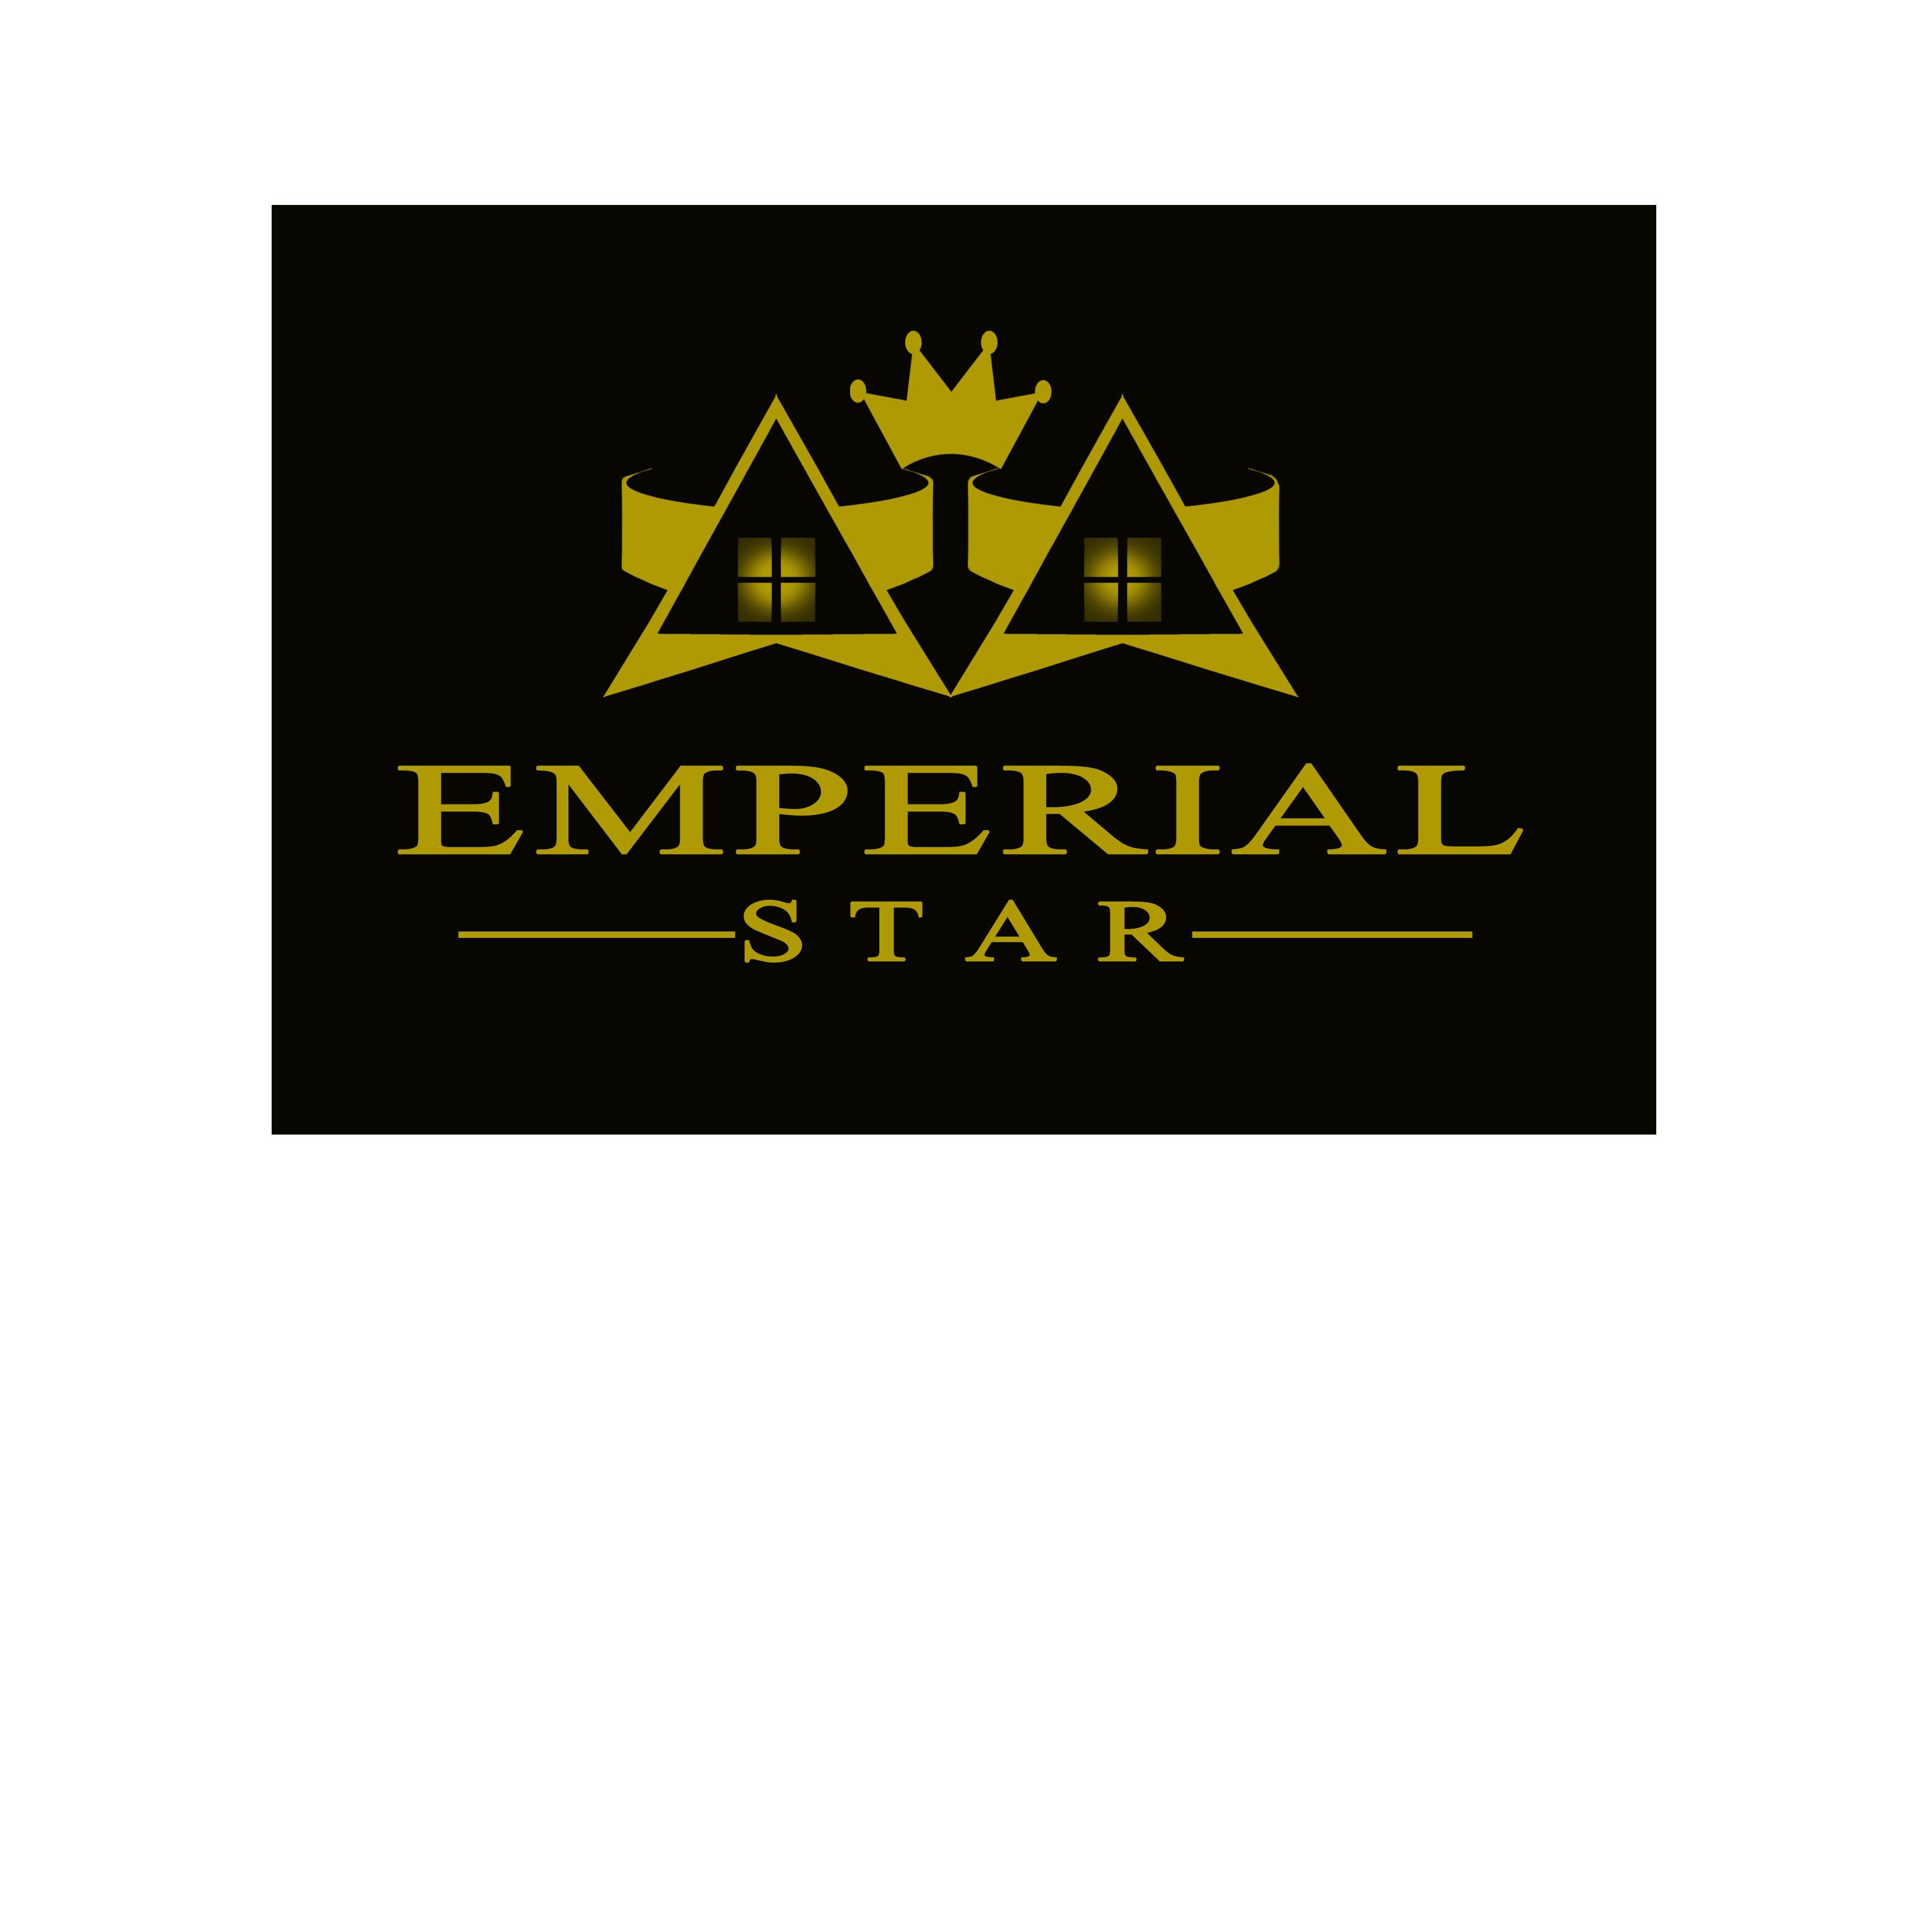 Logo Design by Alan Esclamado - Entry No. 109 in the Logo Design Contest Emperial Star Logo Design.